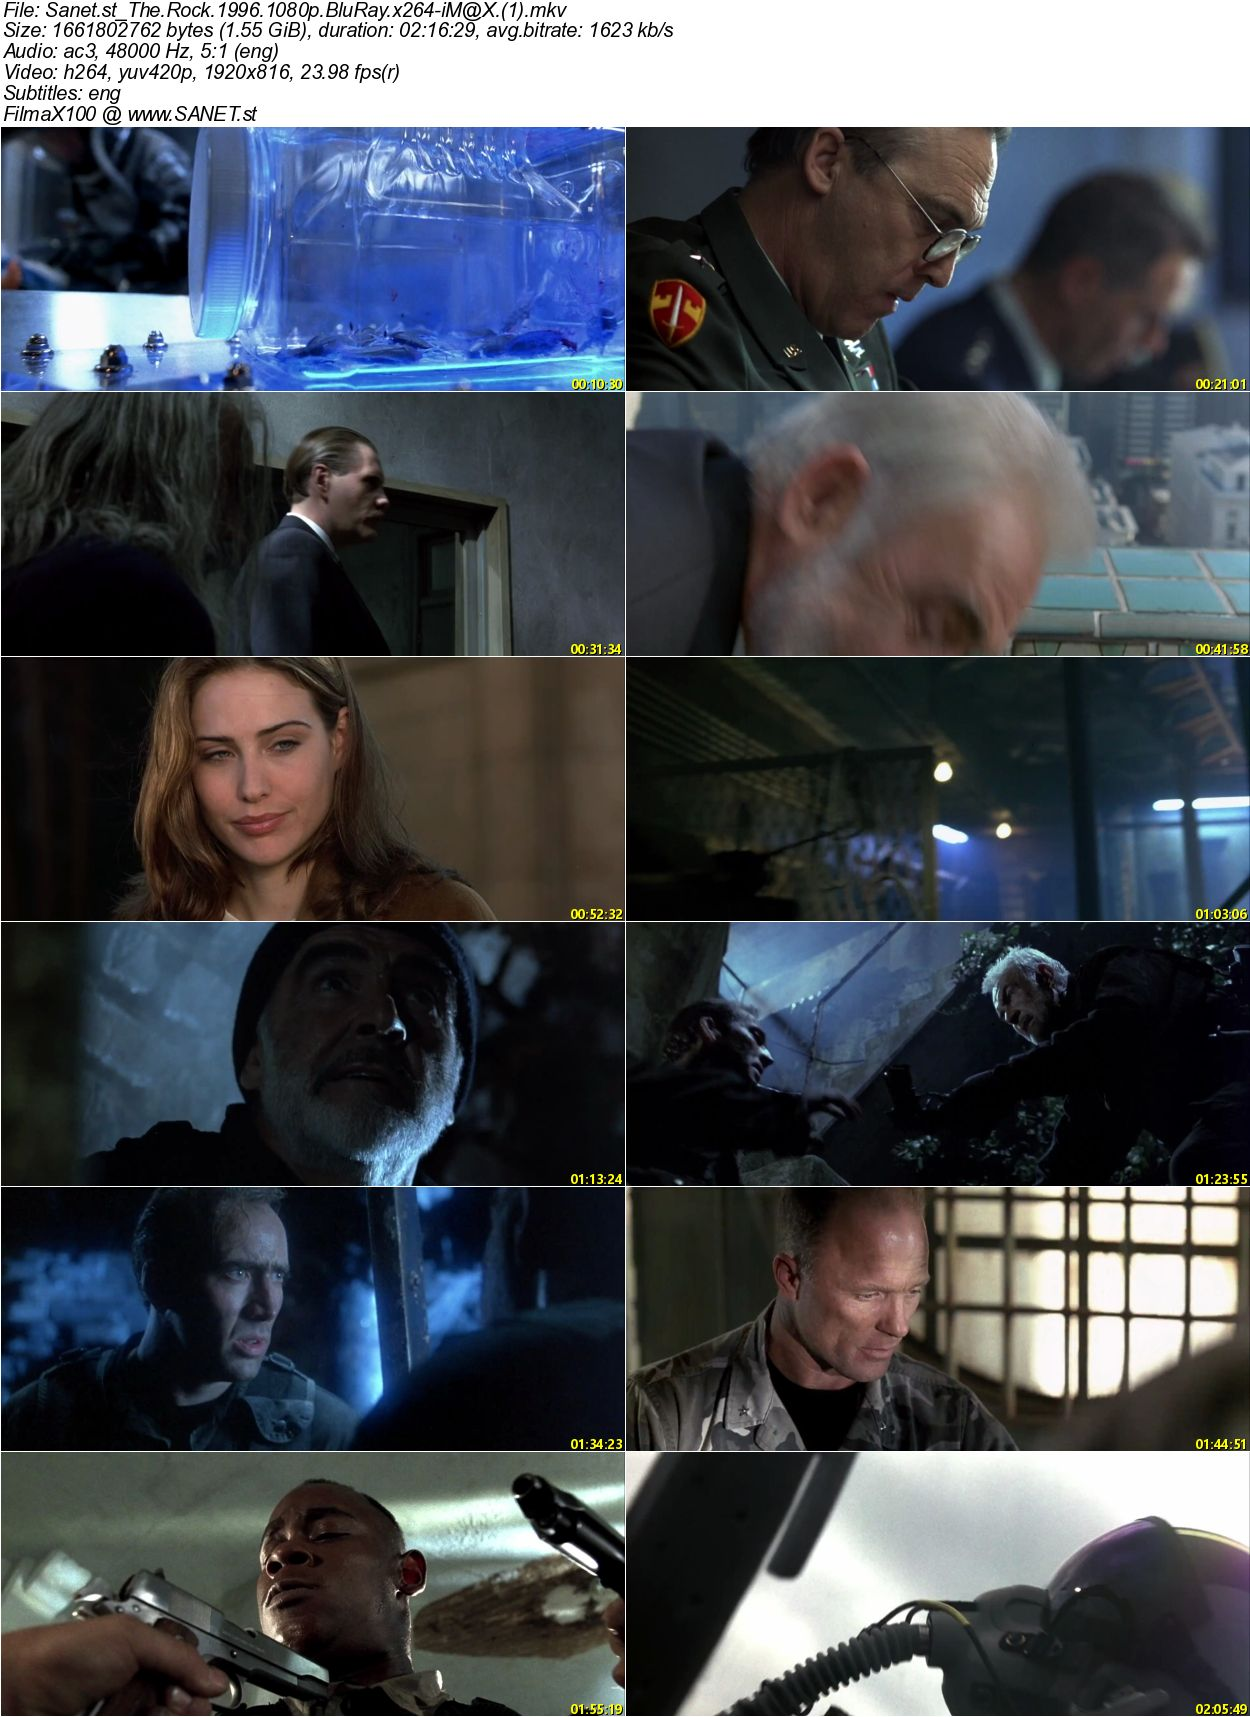 The phantom 1996 1080p Bluray